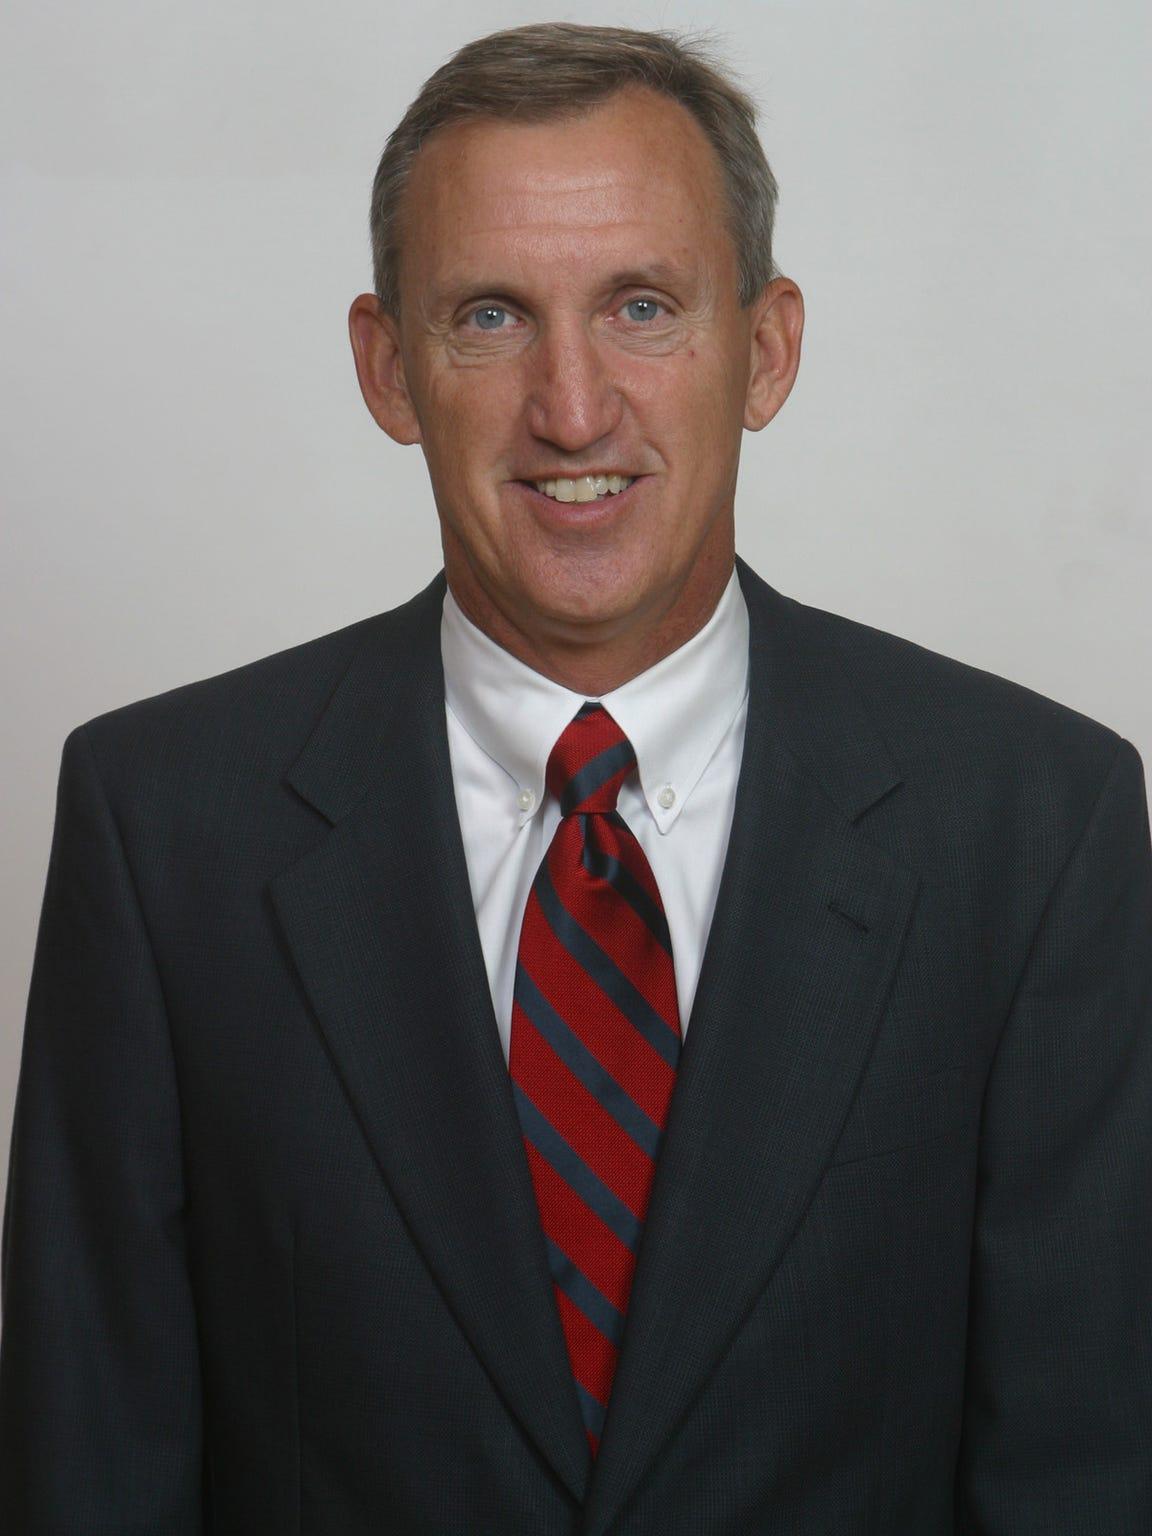 Belmont basketball coach Rick Byrd.